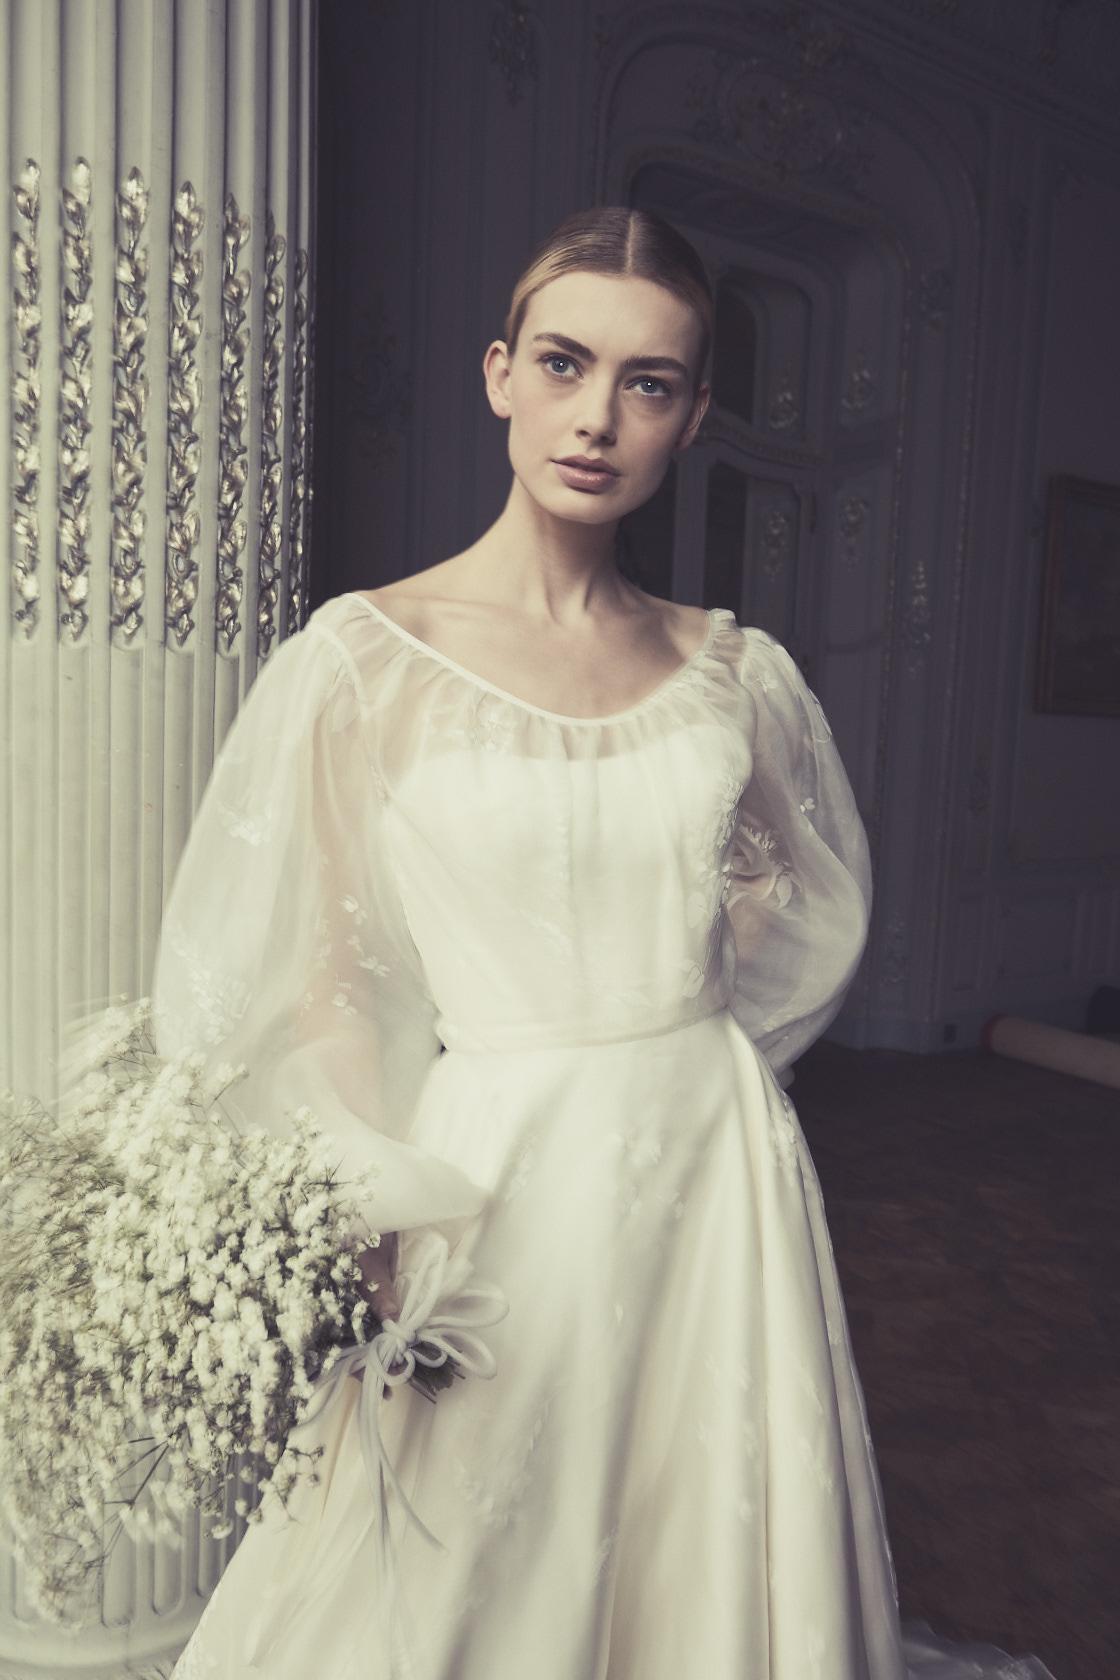 Vienna Wisteria Bridalwear by Phillipa Lepley, London Wedding Dress Designer Organza Wedding Dress